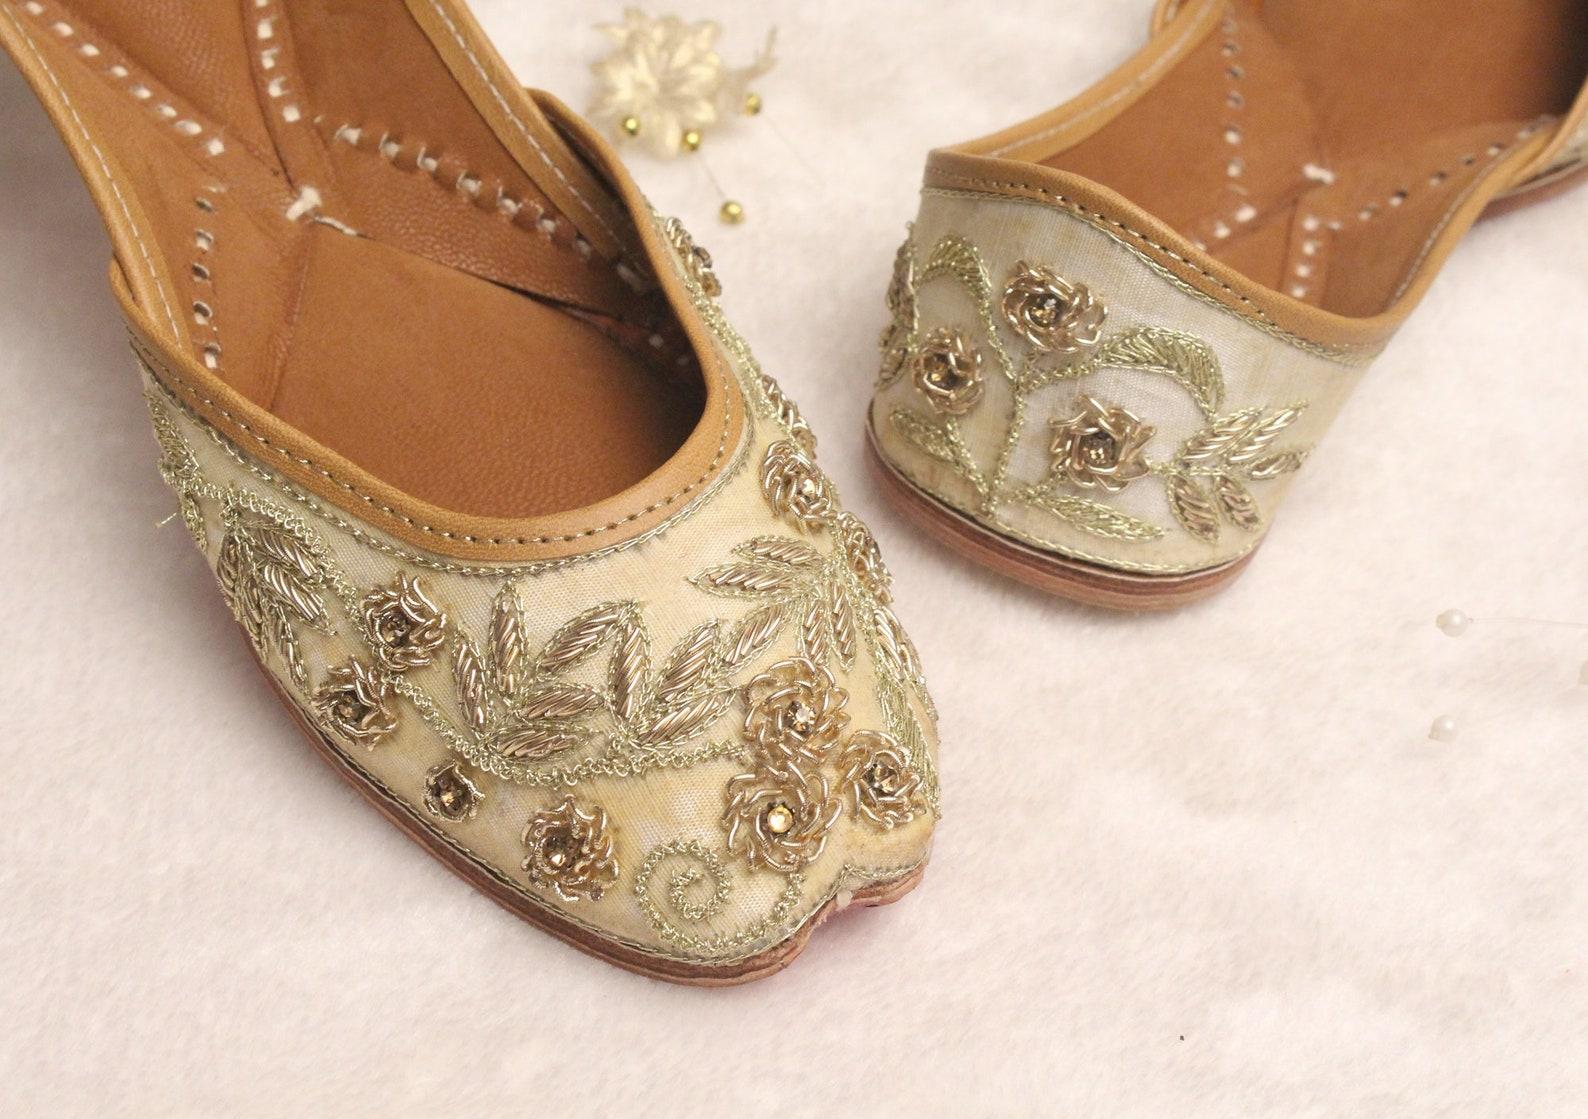 bridal flat shoes wedding/women lehnga gold jutti shoes/indian wedding flats/gold ballet flats/bollywood khussa punjabi shoes us